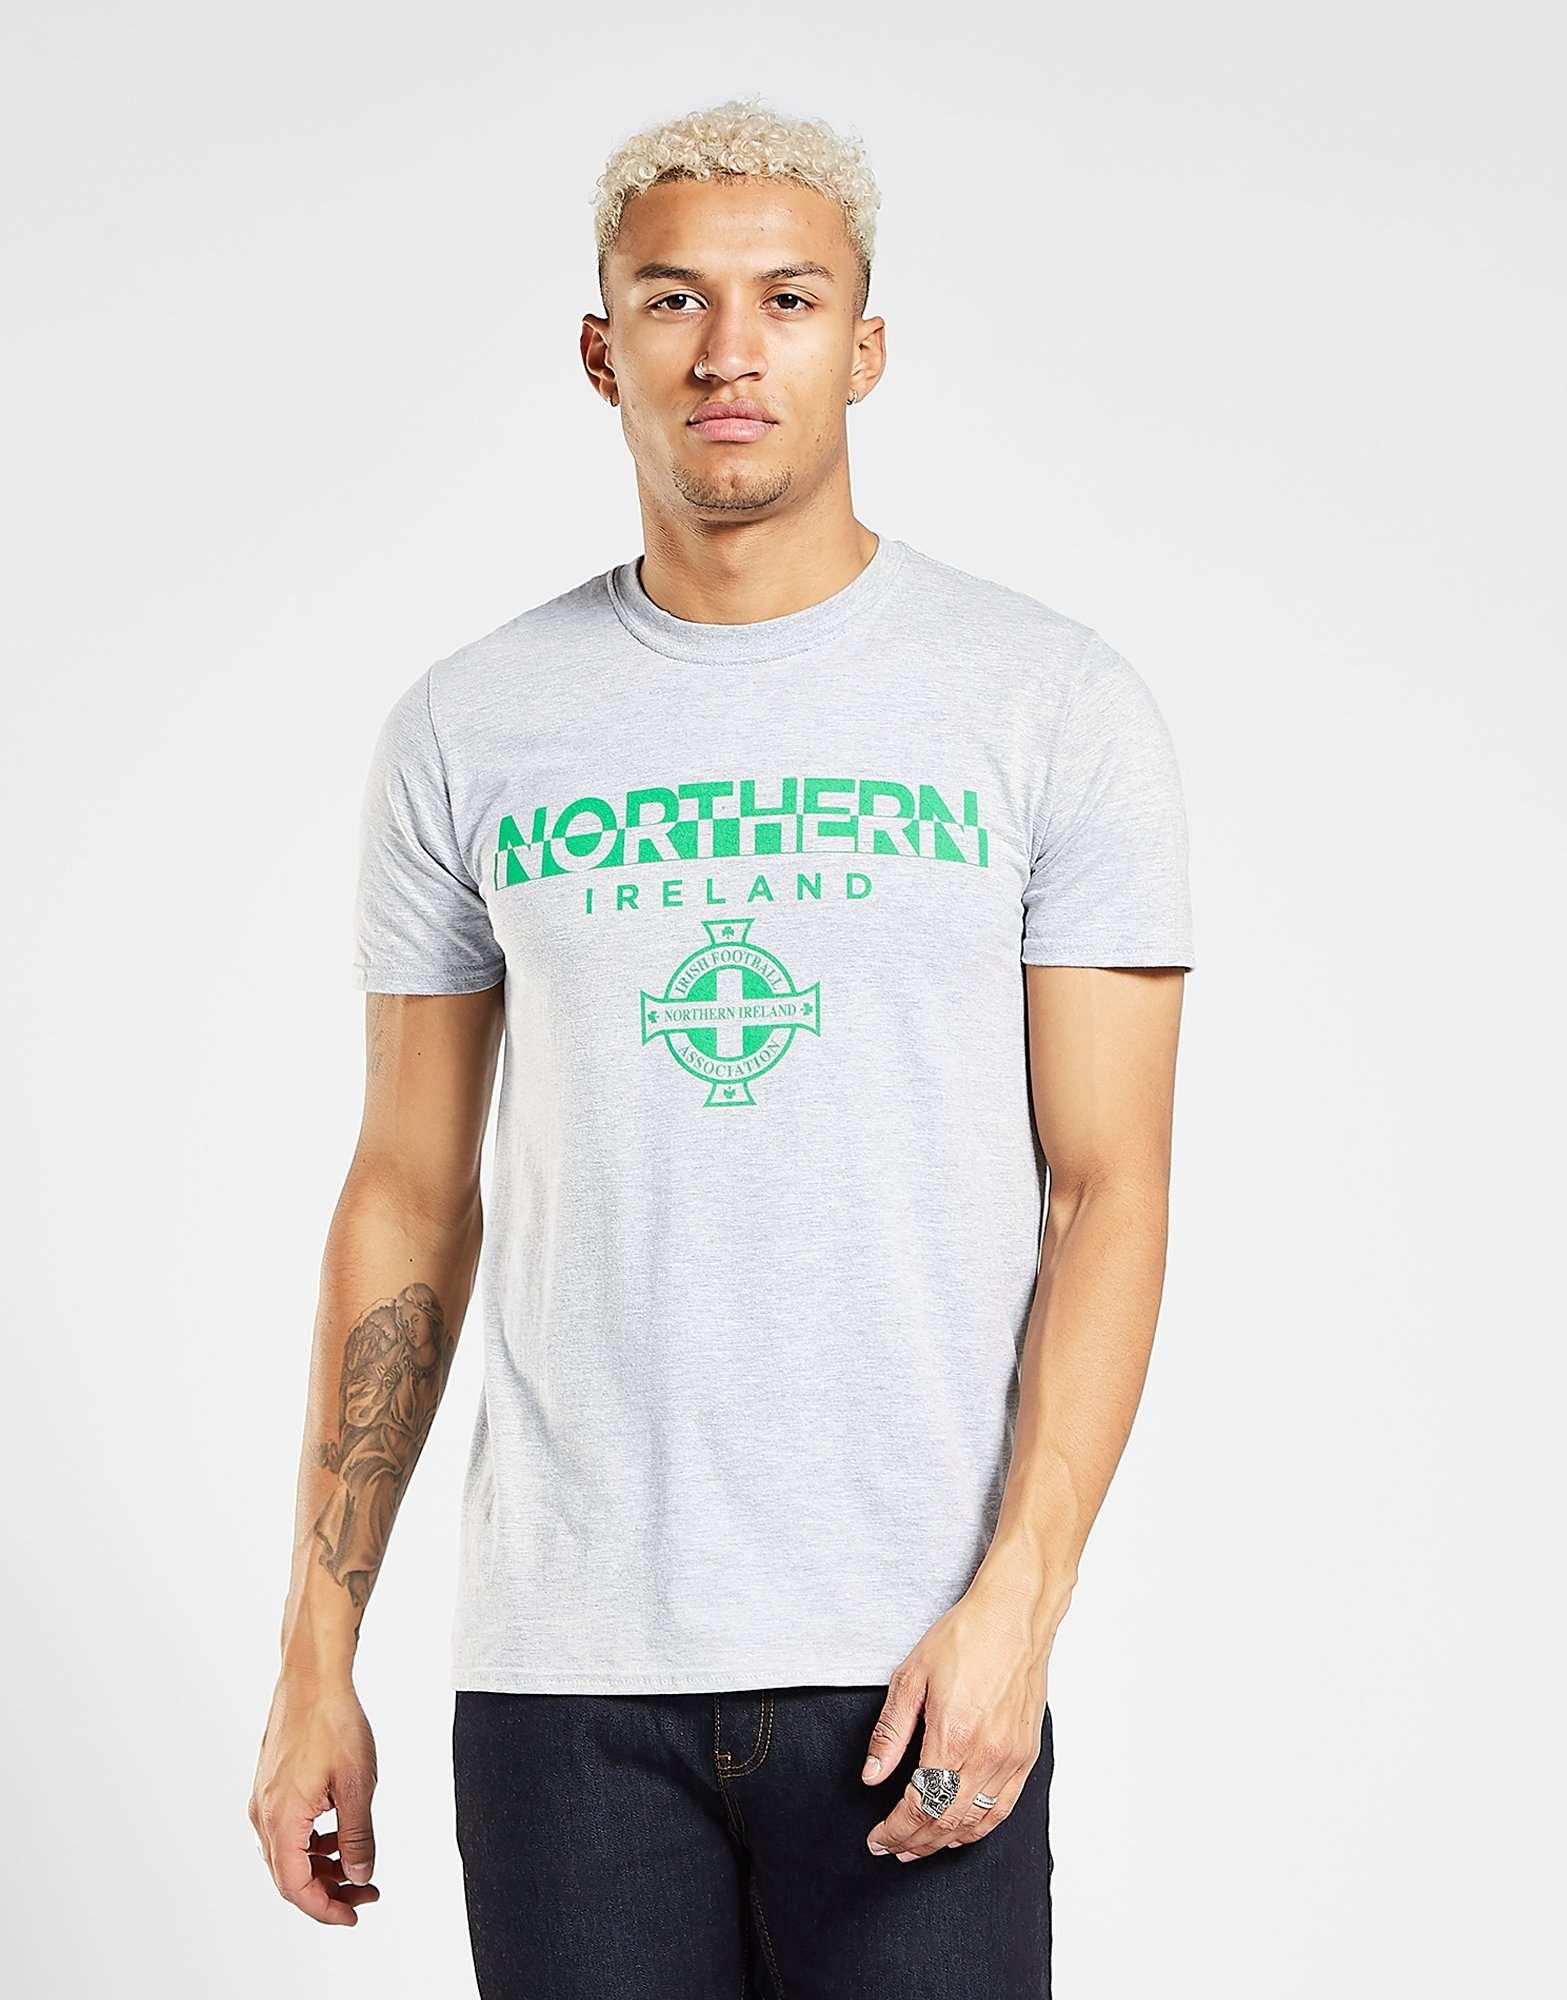 Official Team Northern Ireland Split T-Shirt